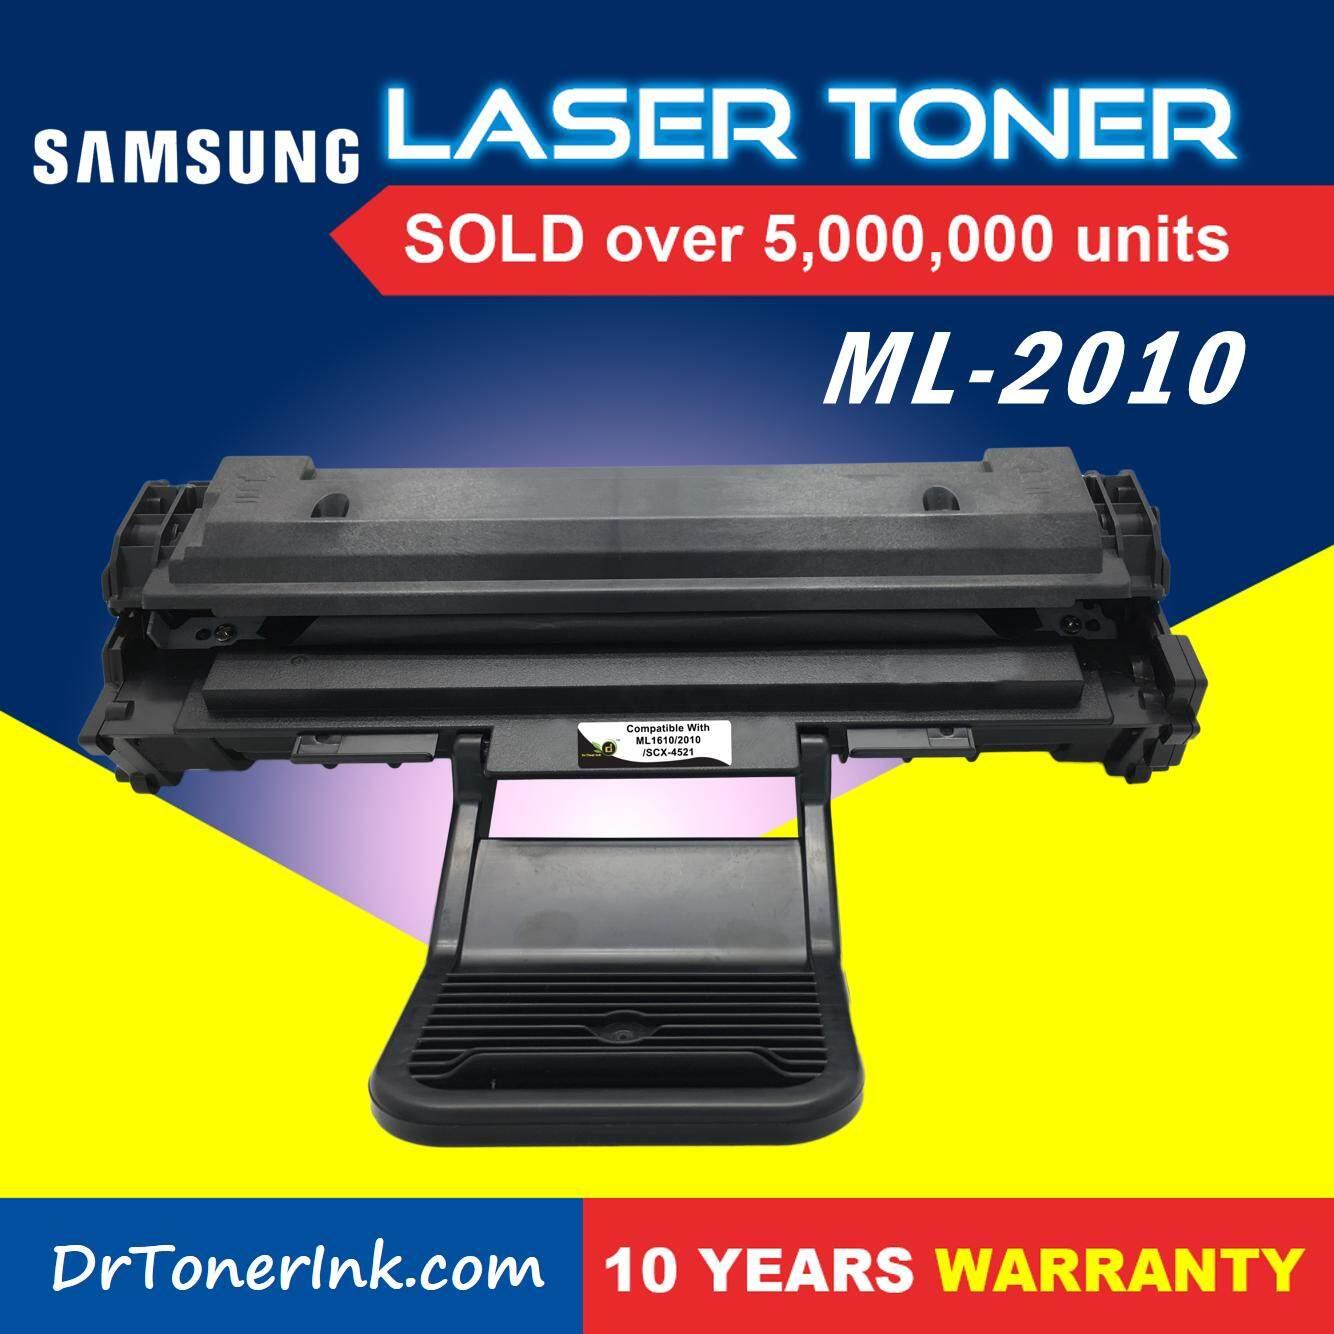 Samsung ML-2510 Printer Universal Print Driver